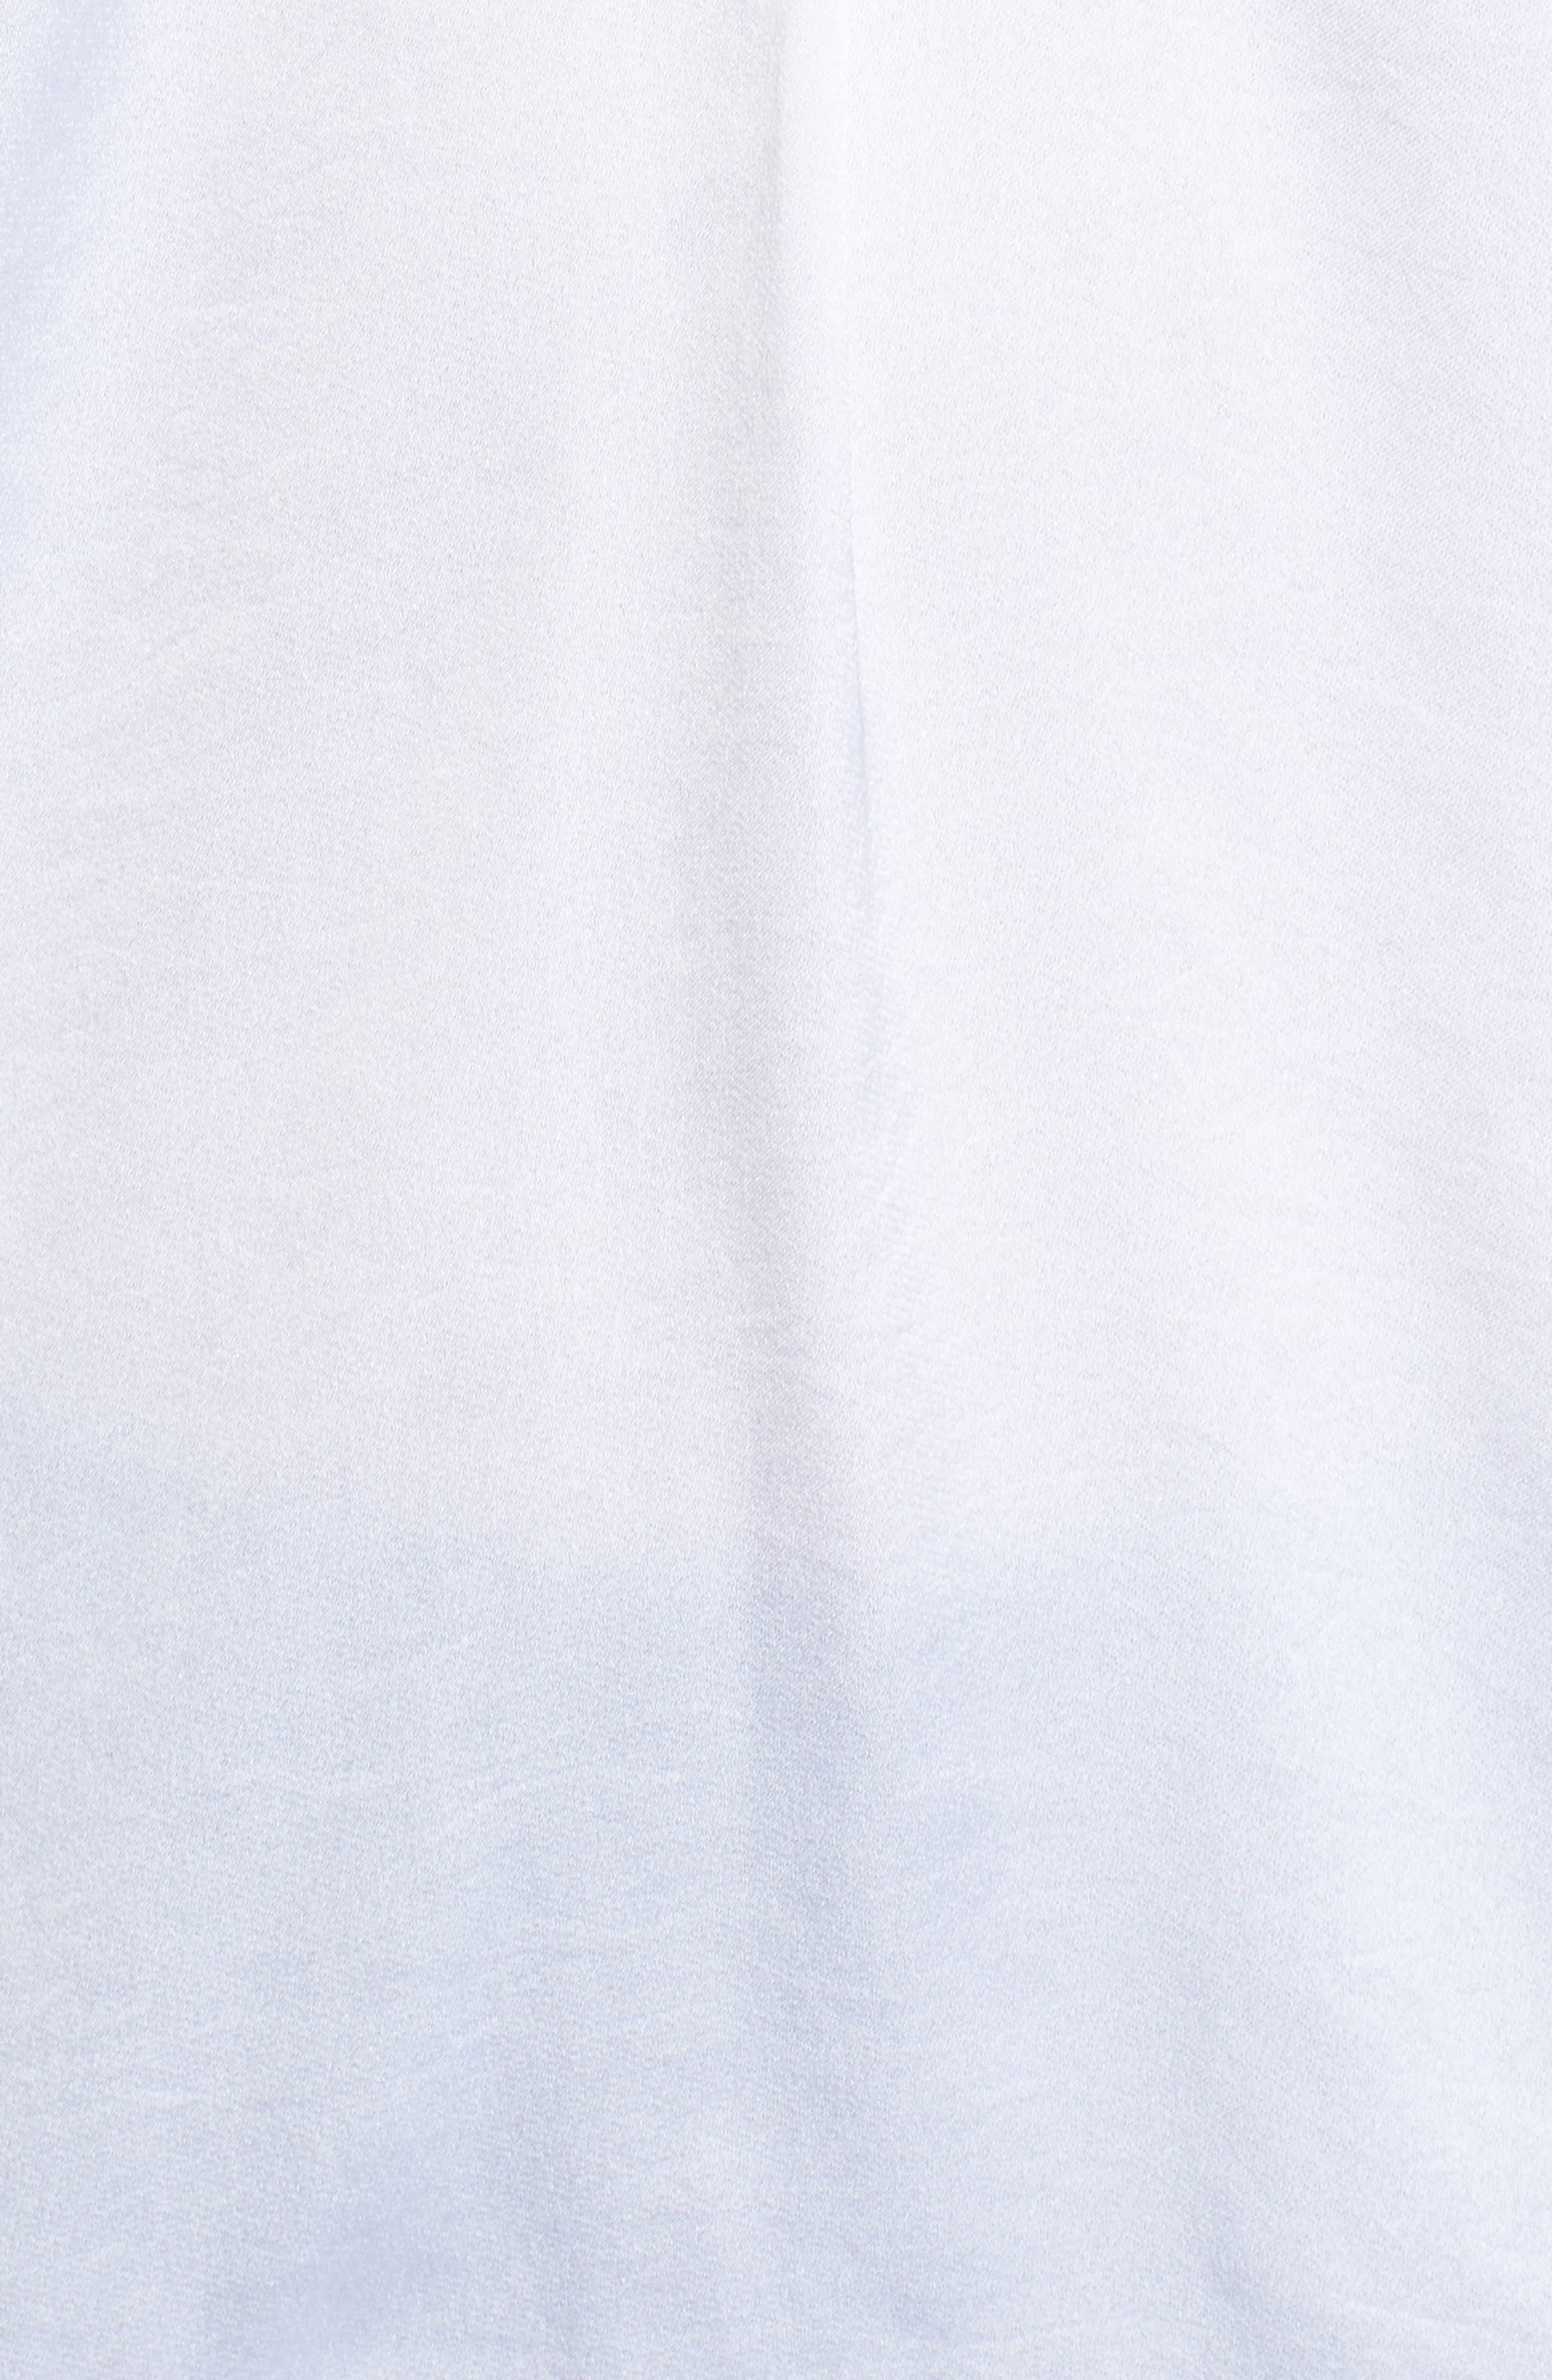 Enisy Tie Neck Top,                             Alternate thumbnail 5, color,                             Vanilla Light